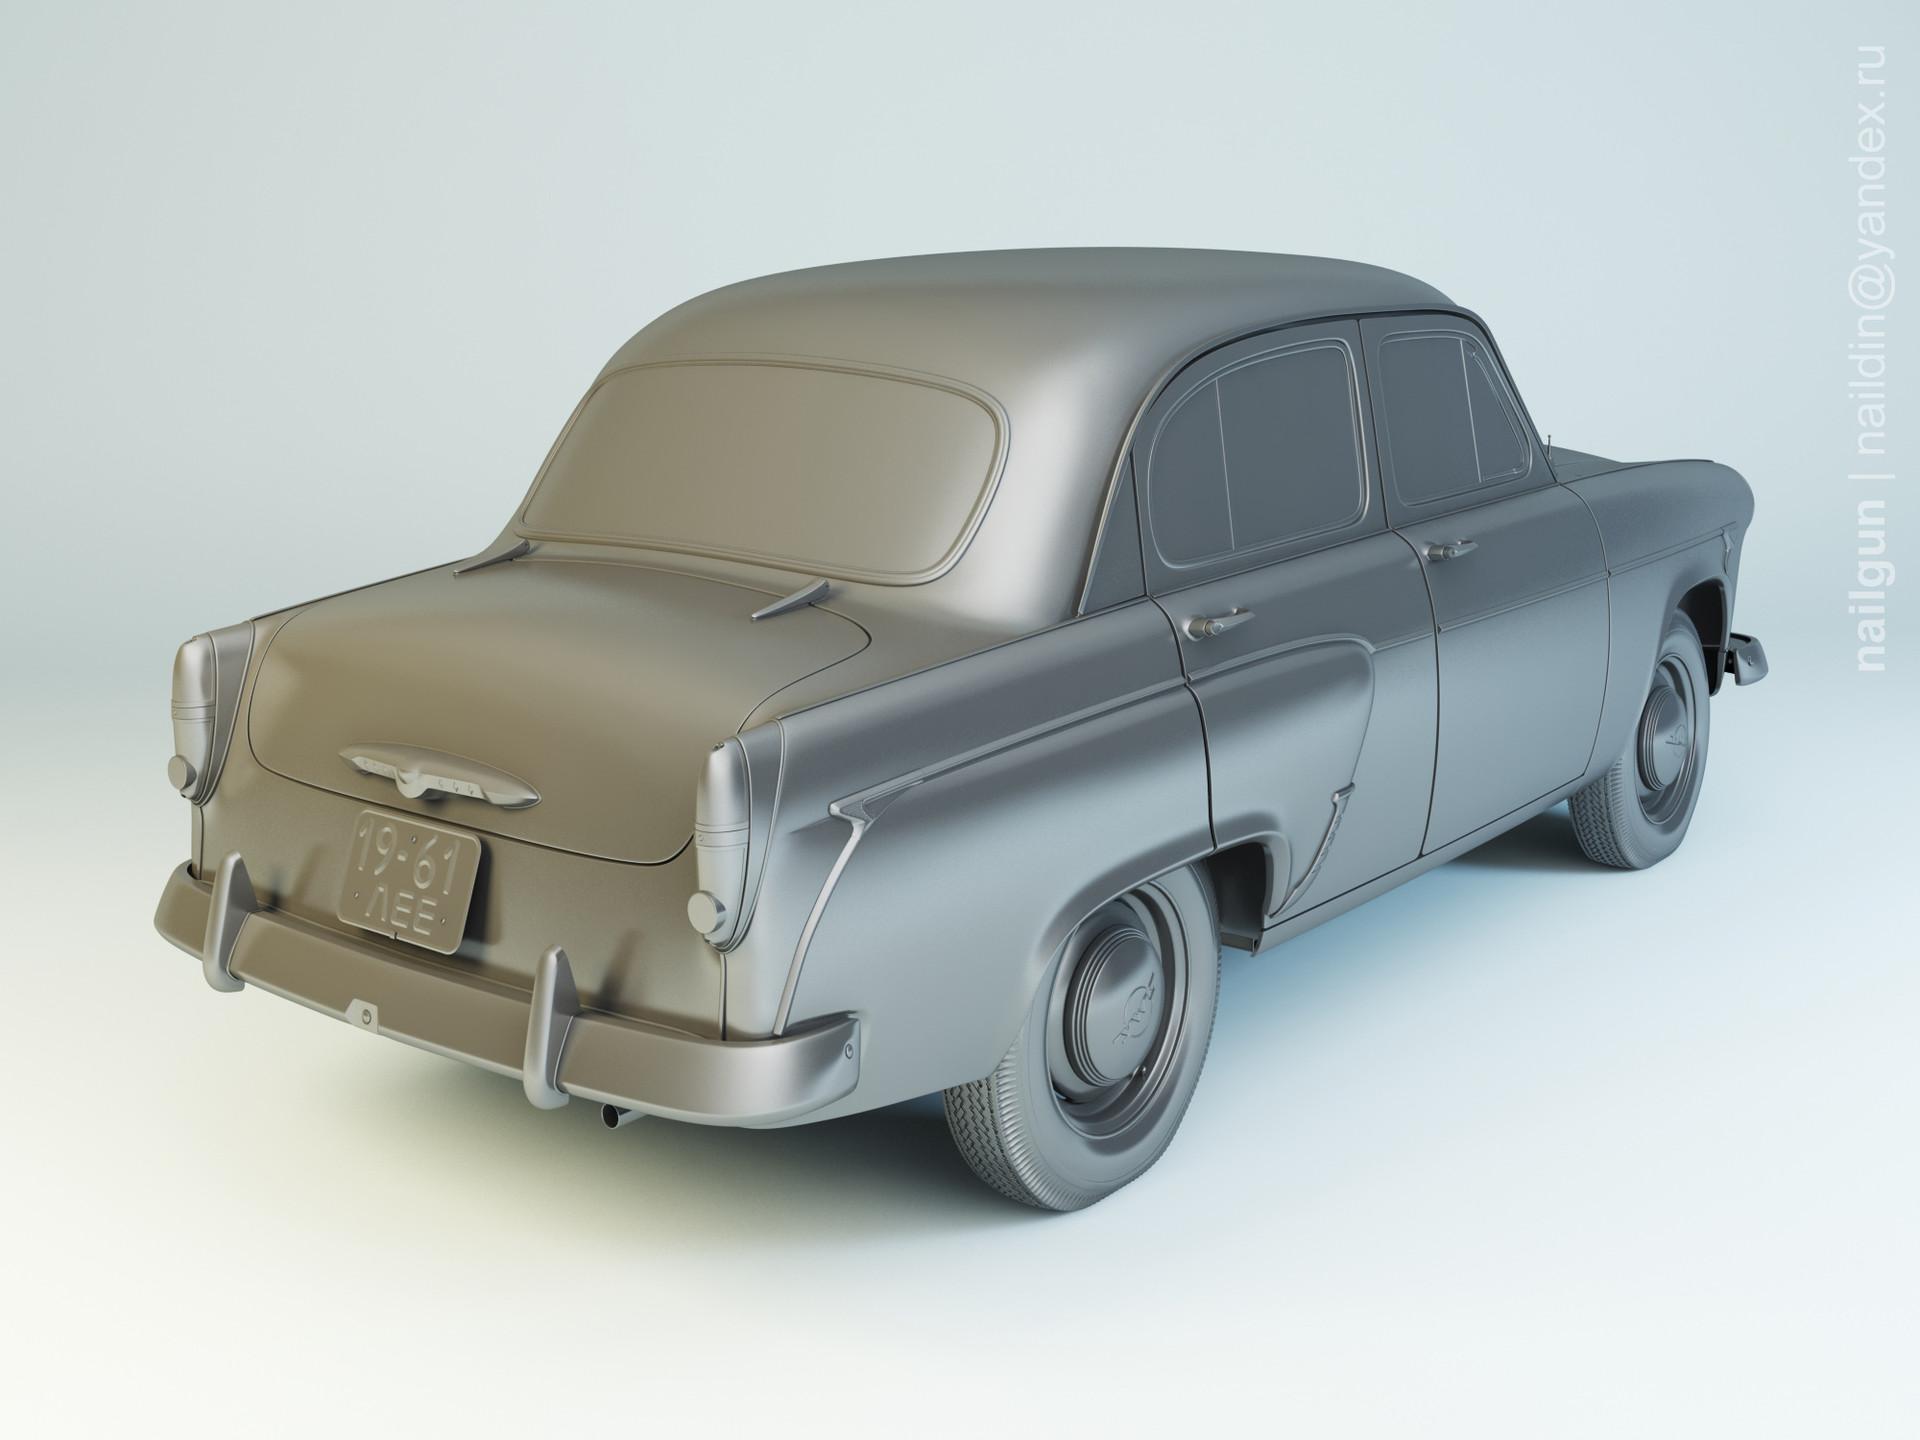 Nail khusnutdinov al 141 003 moskvich 407 modelling 1